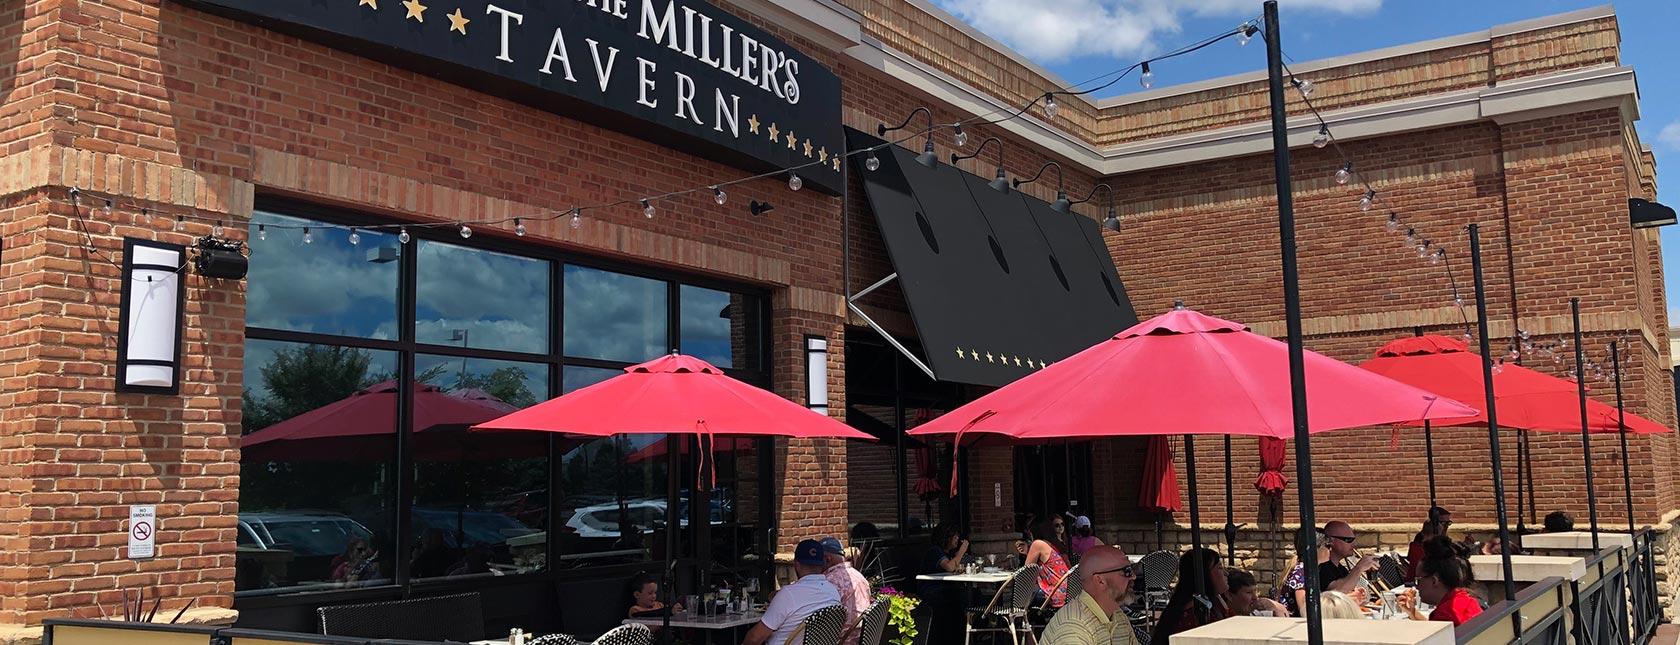 Exterior patio at Matt the Miller's Tavern at Gemini Place